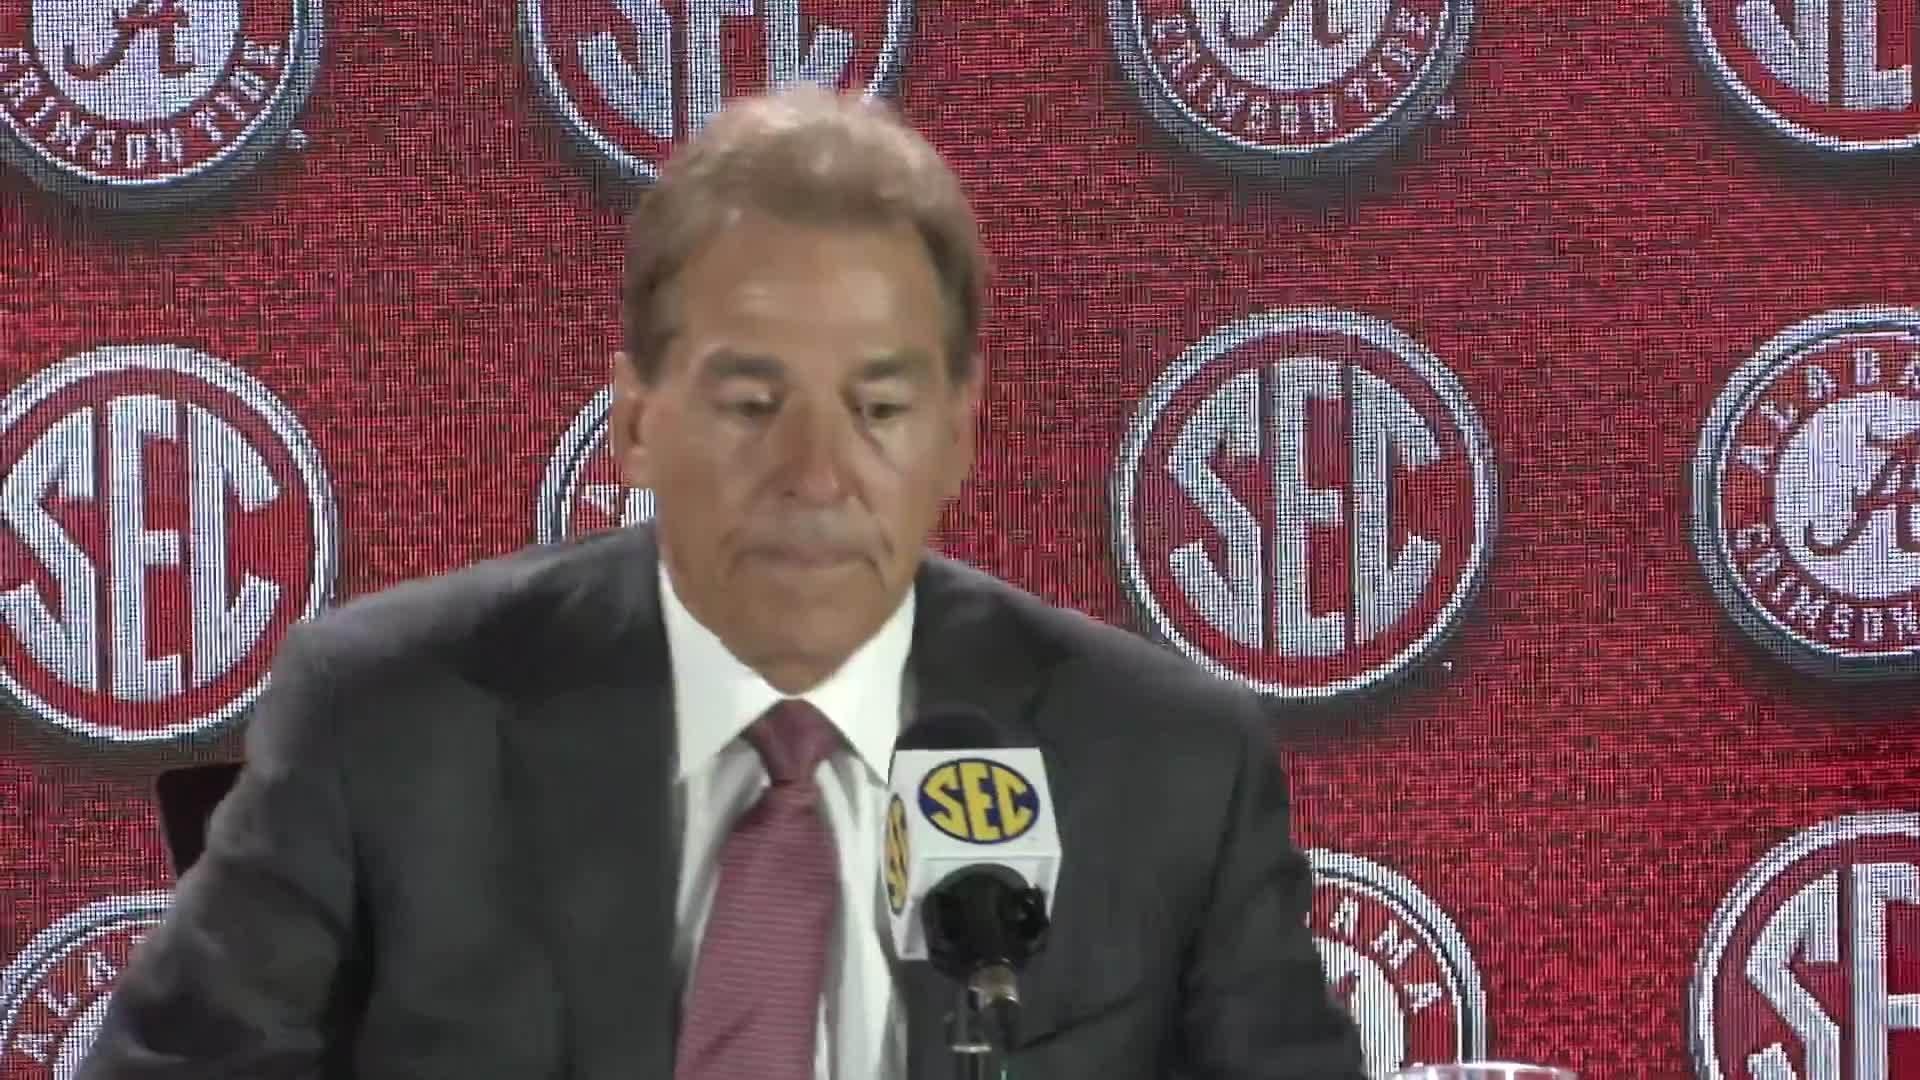 Watch what Alabama head coach Nick Saban had to say at SEC Media Days 2018